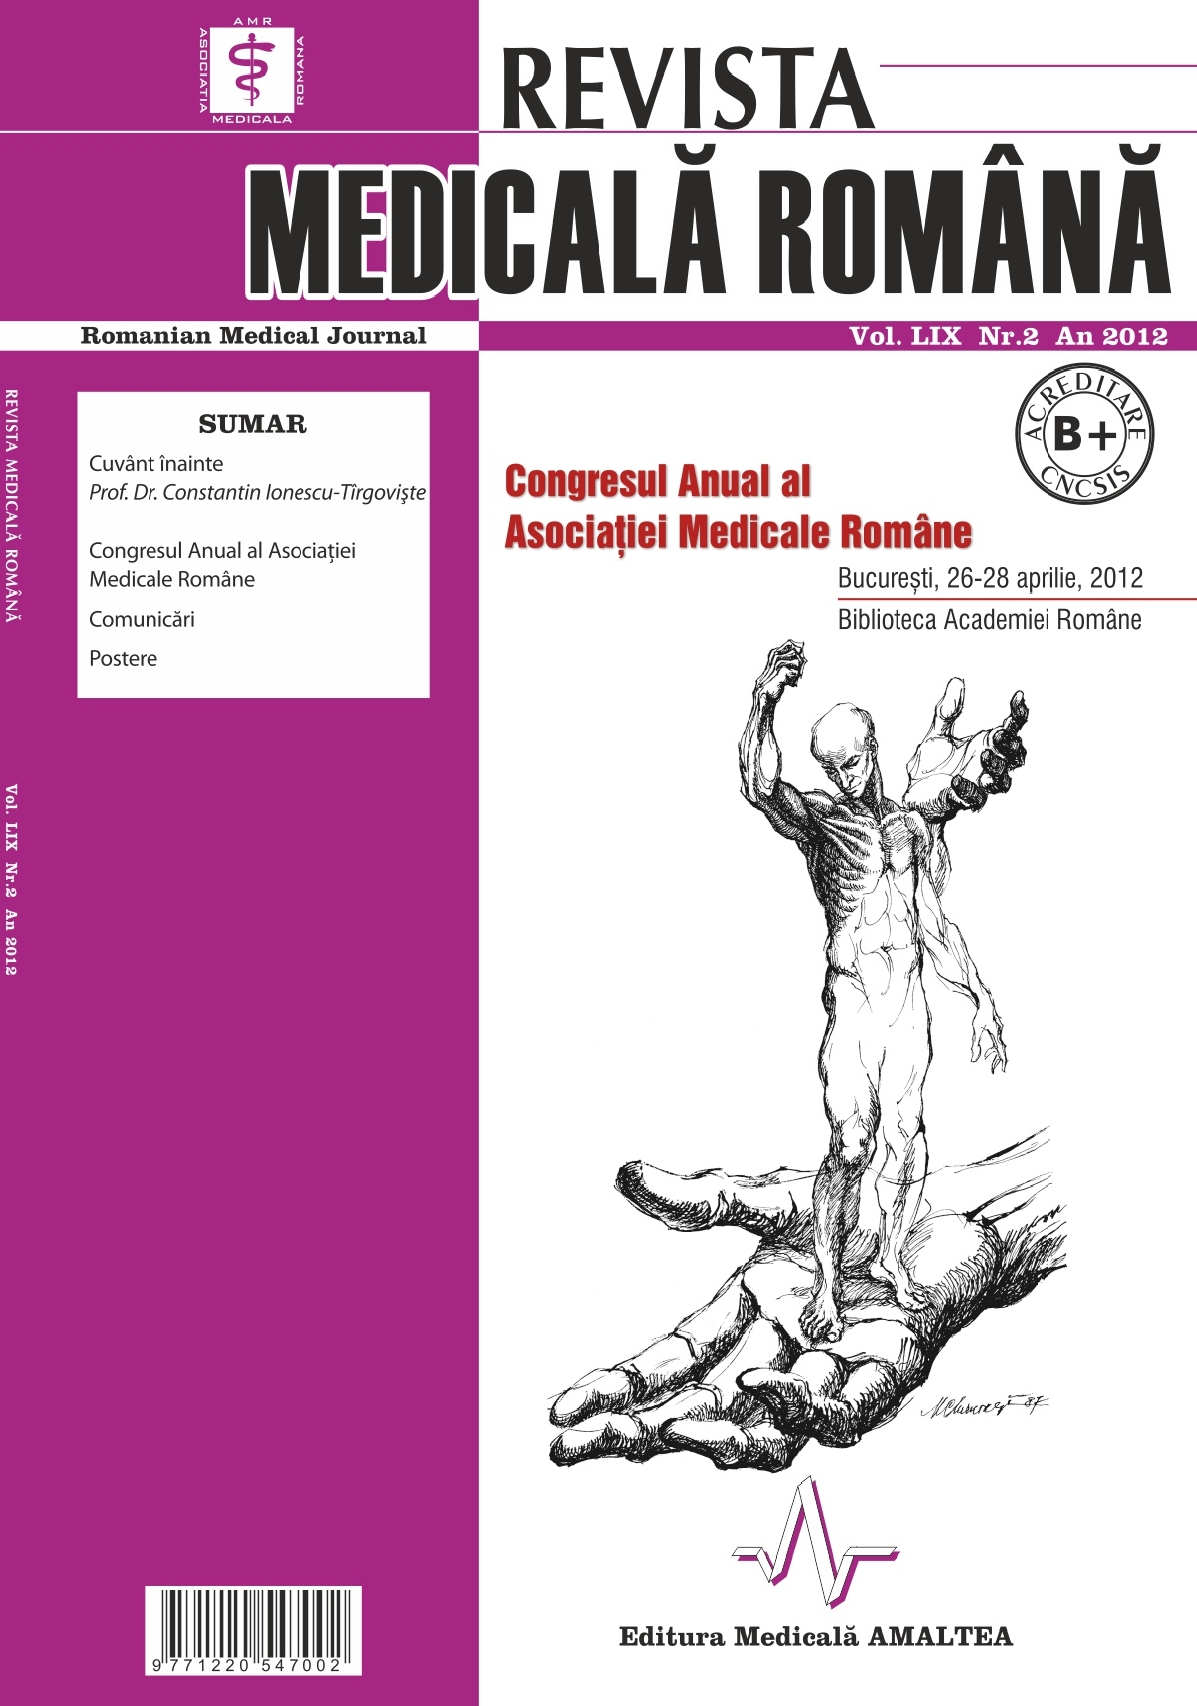 REVISTA MEDICALA ROMANA - Romanian Medical Journal, Vol. LIX, Nr. 2, An 2012